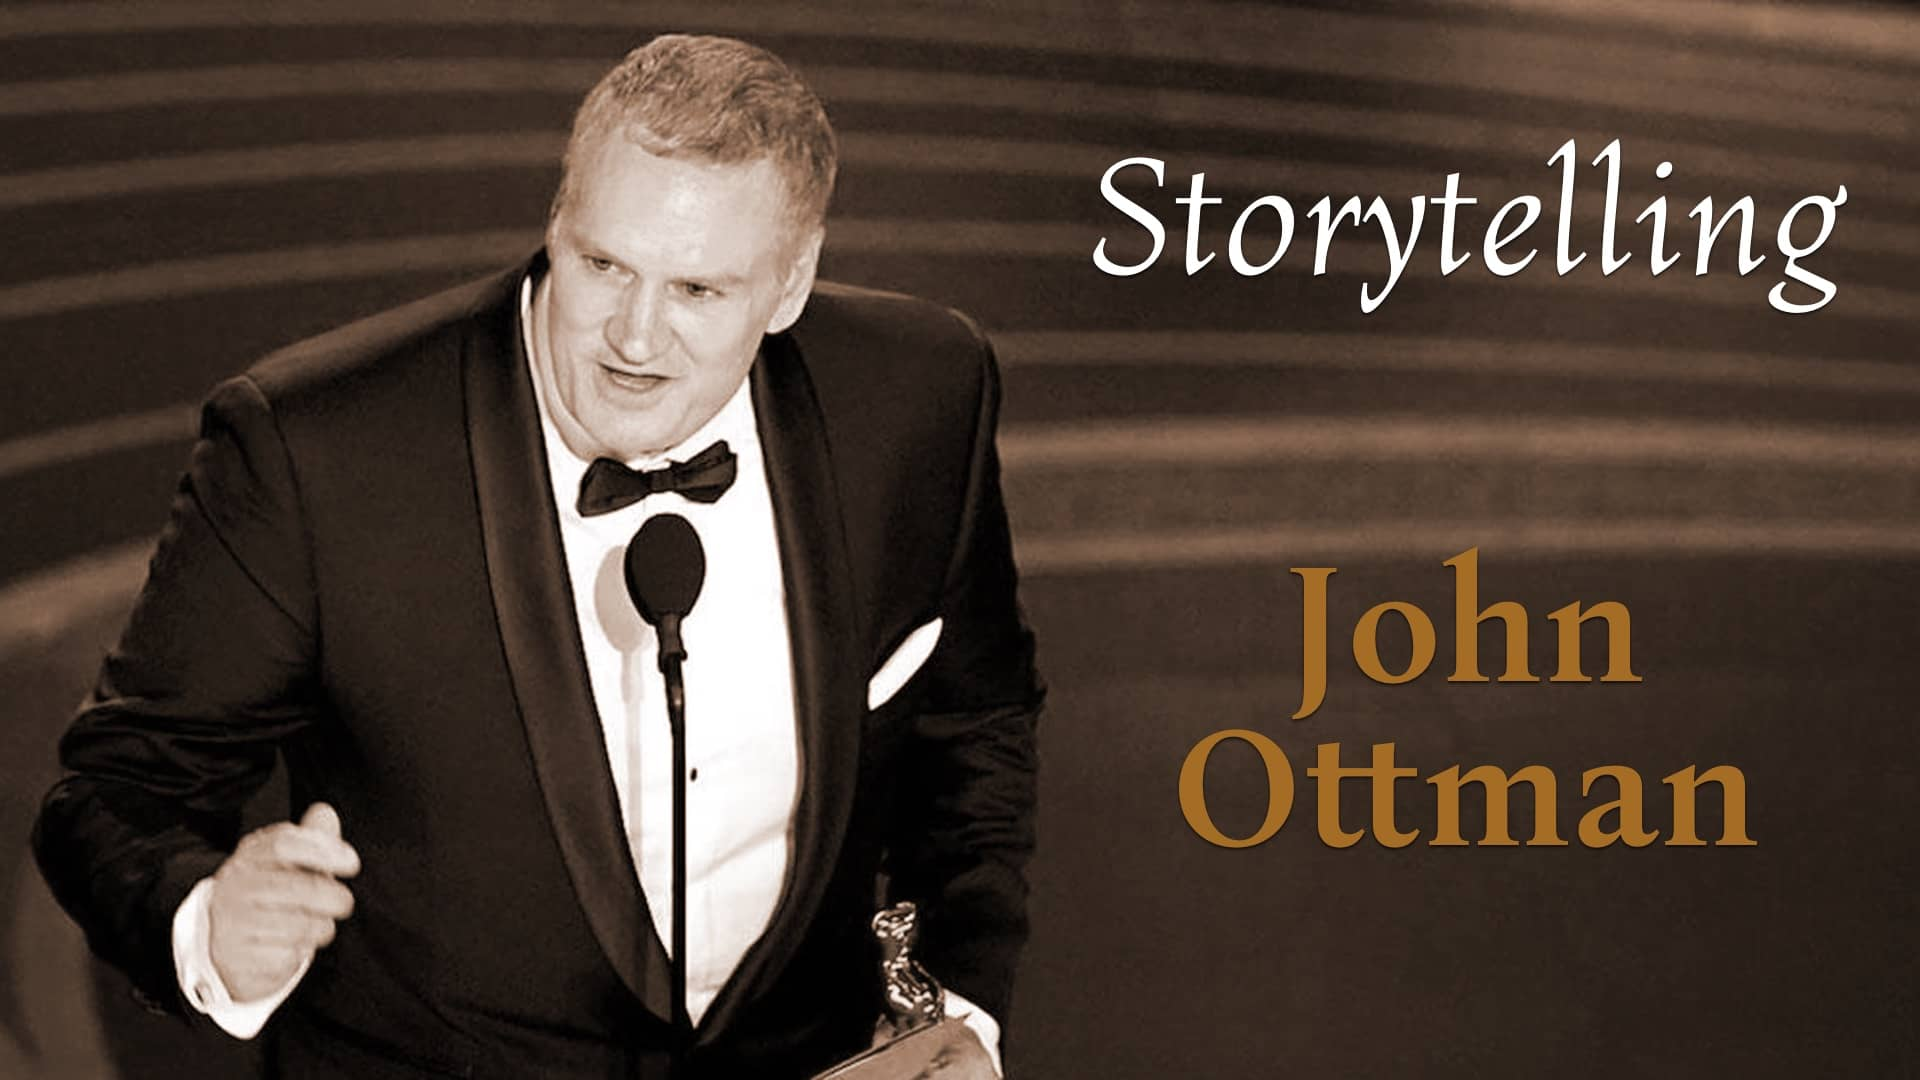 John Ottman Storytelling